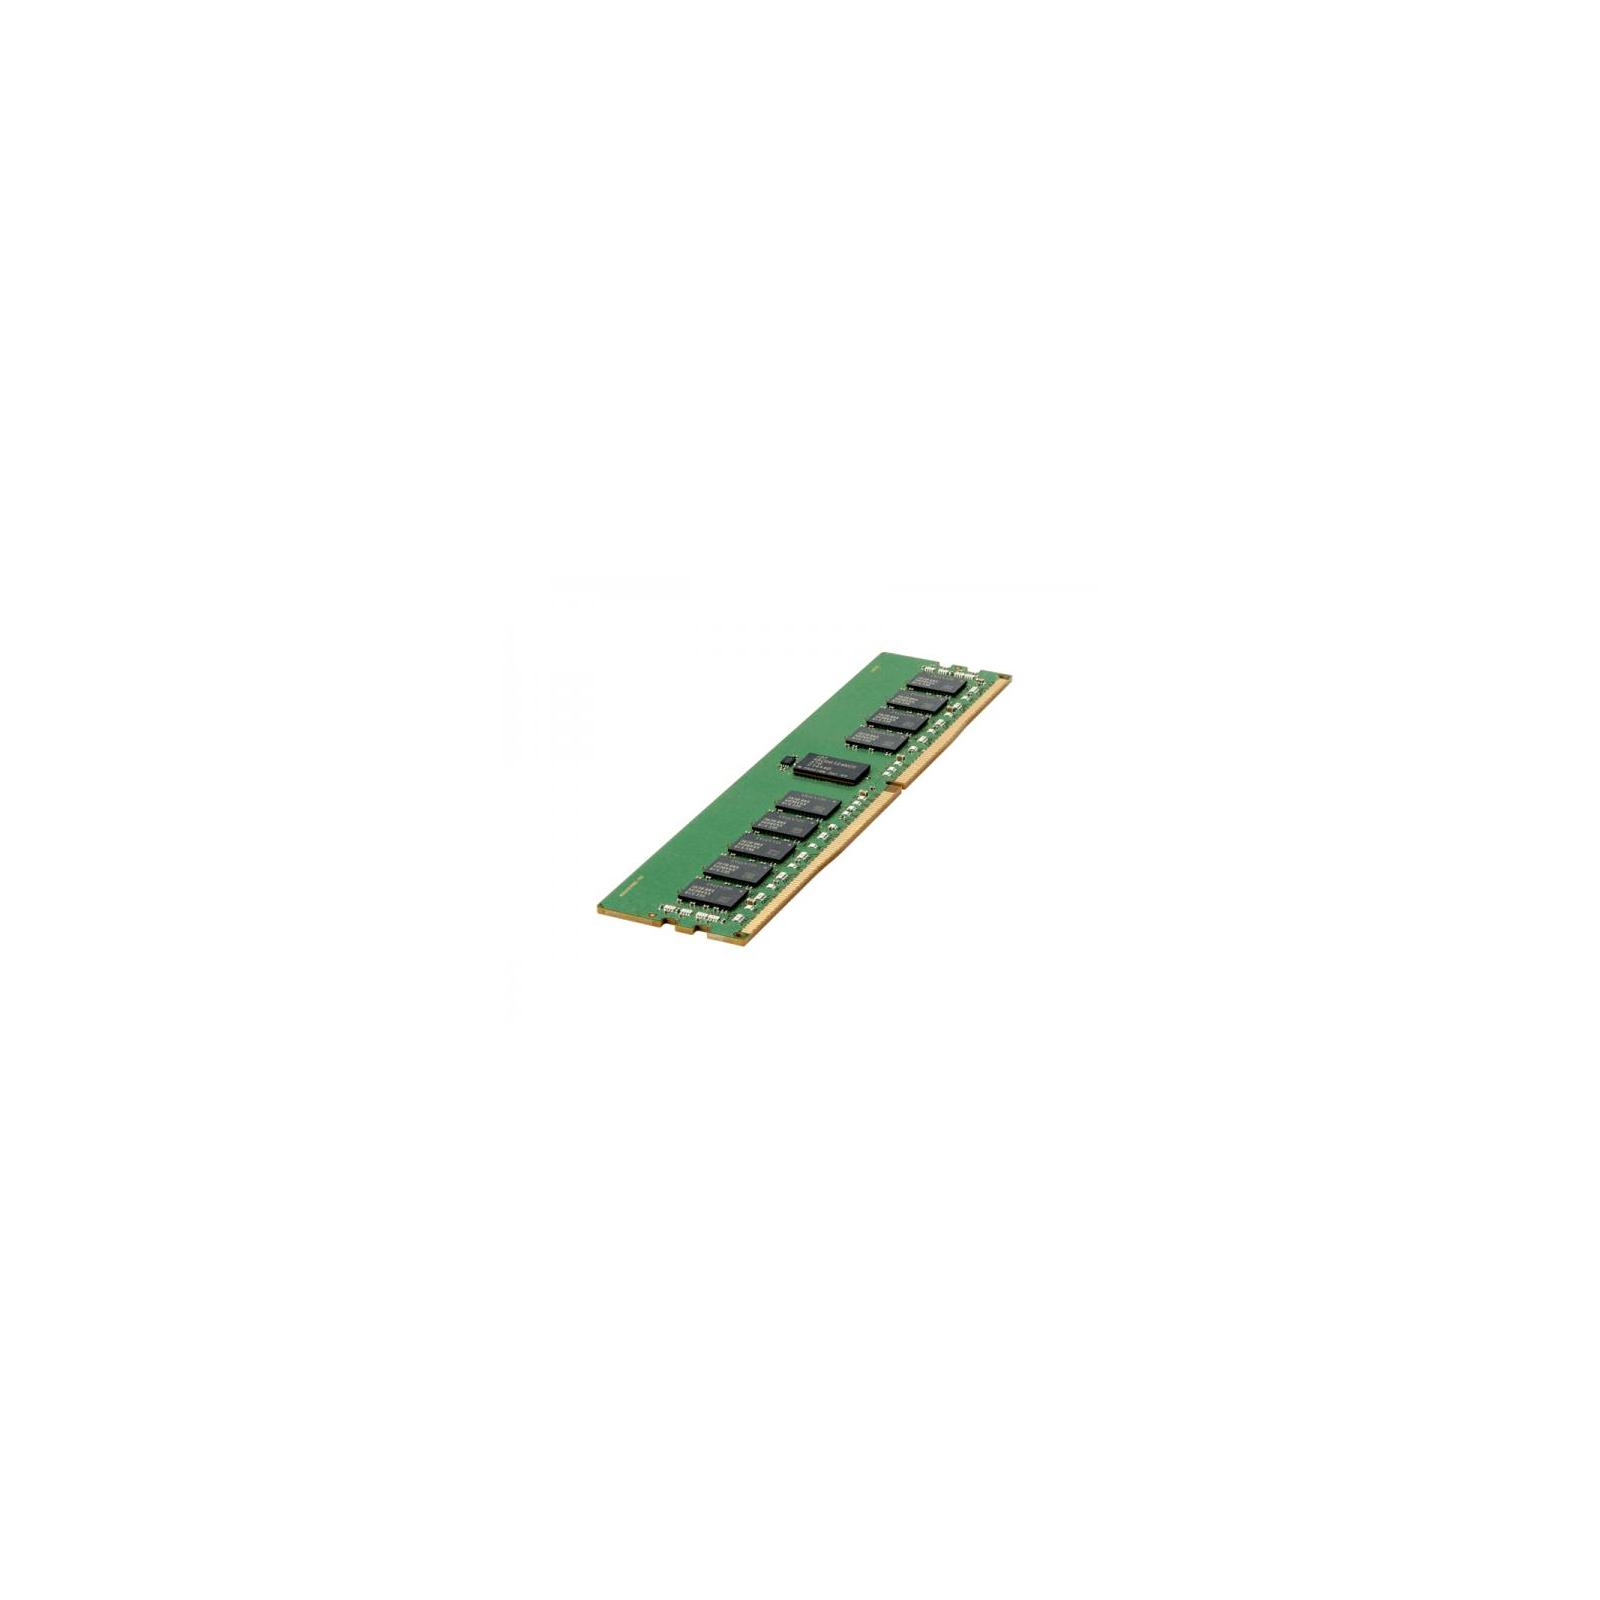 Модуль памяти для сервера DDR4 32GB ECC RDIMM 2400MHz 2Rx4 1.2V CL17 HP (805351-B21)